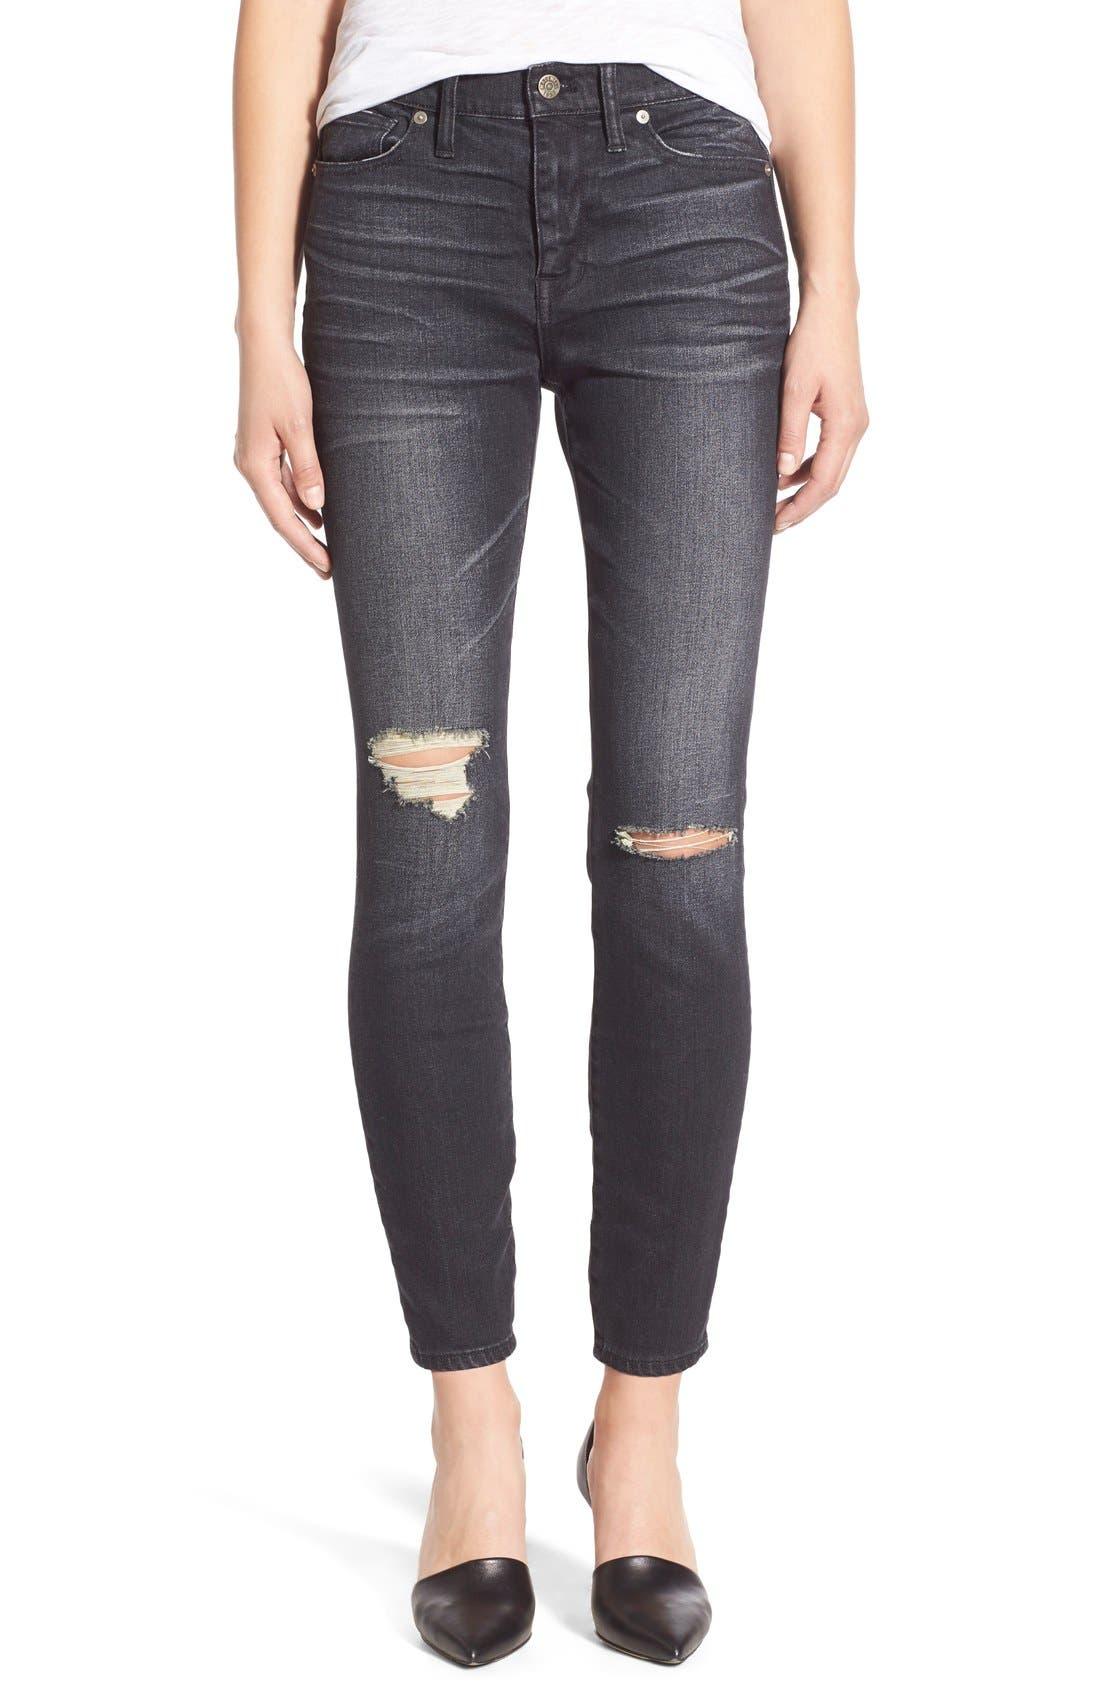 Main Image - Madewell 'High Riser' Skinny Skinny Jeans (Kincaid Wash)